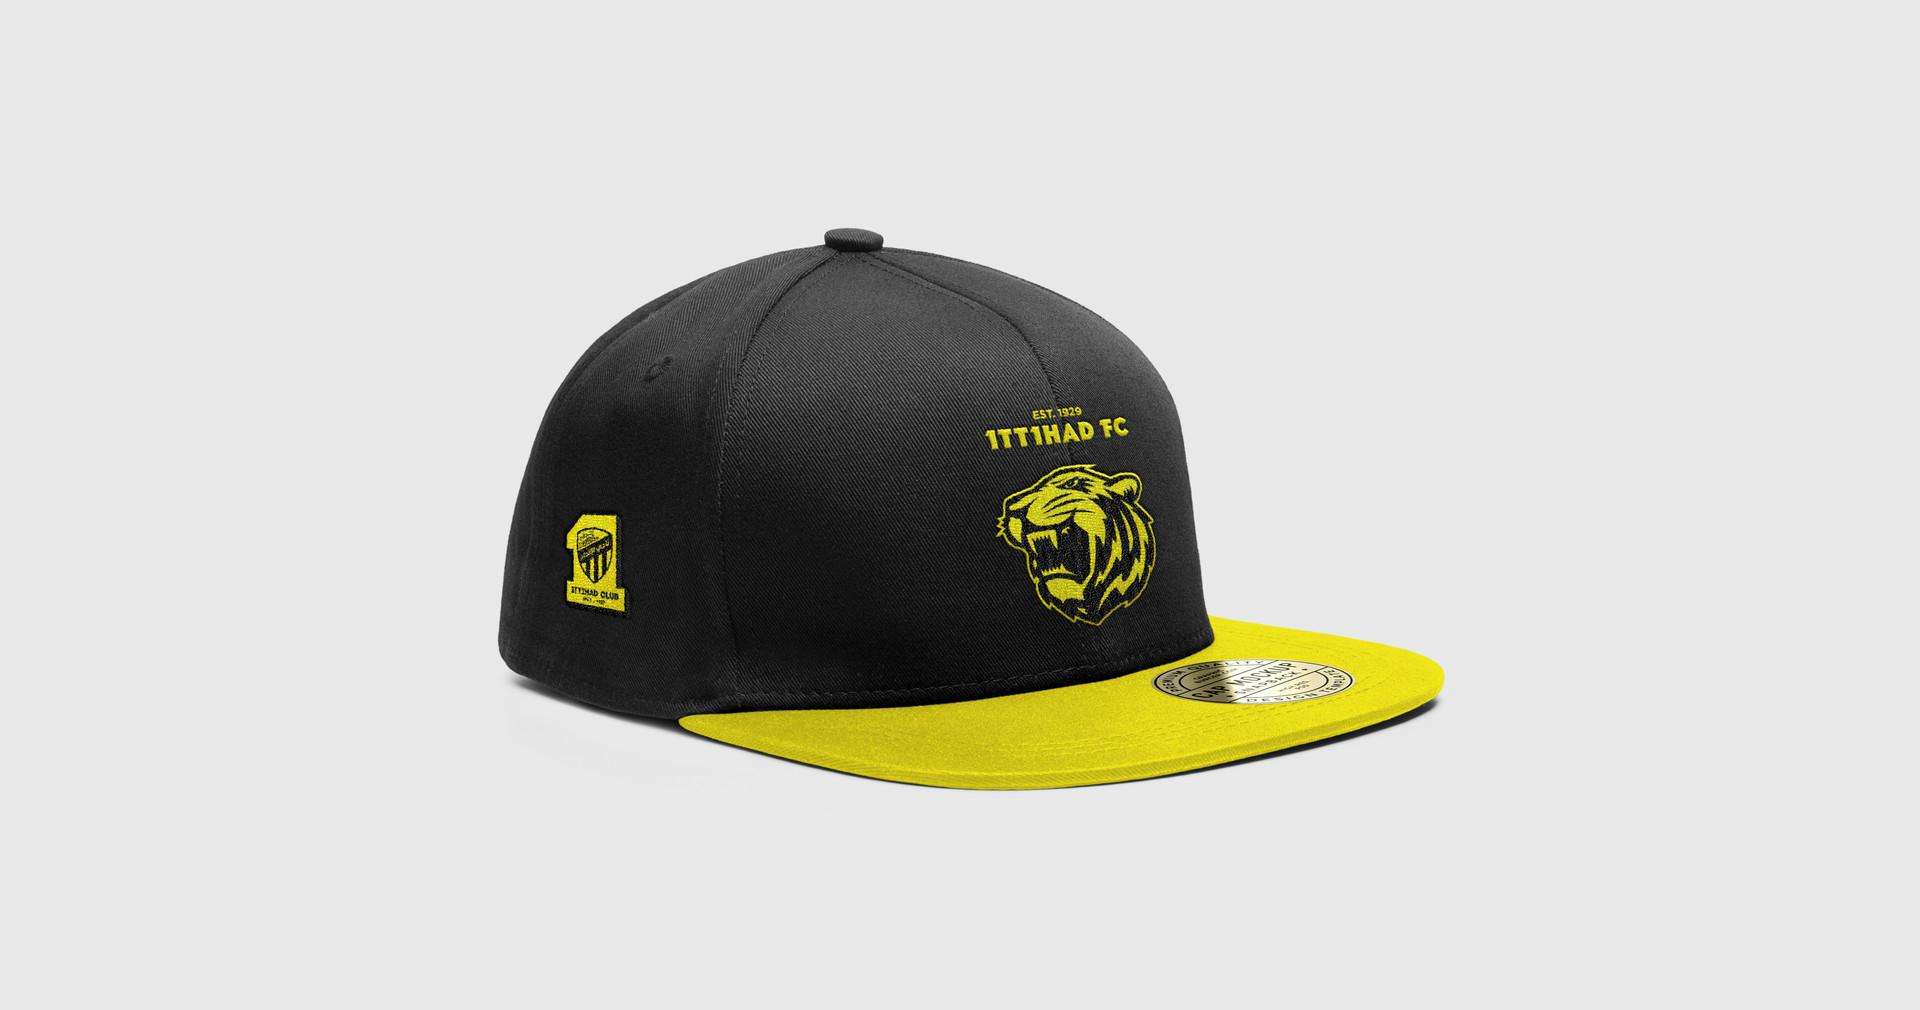 Ittihad FC Hat.jpg